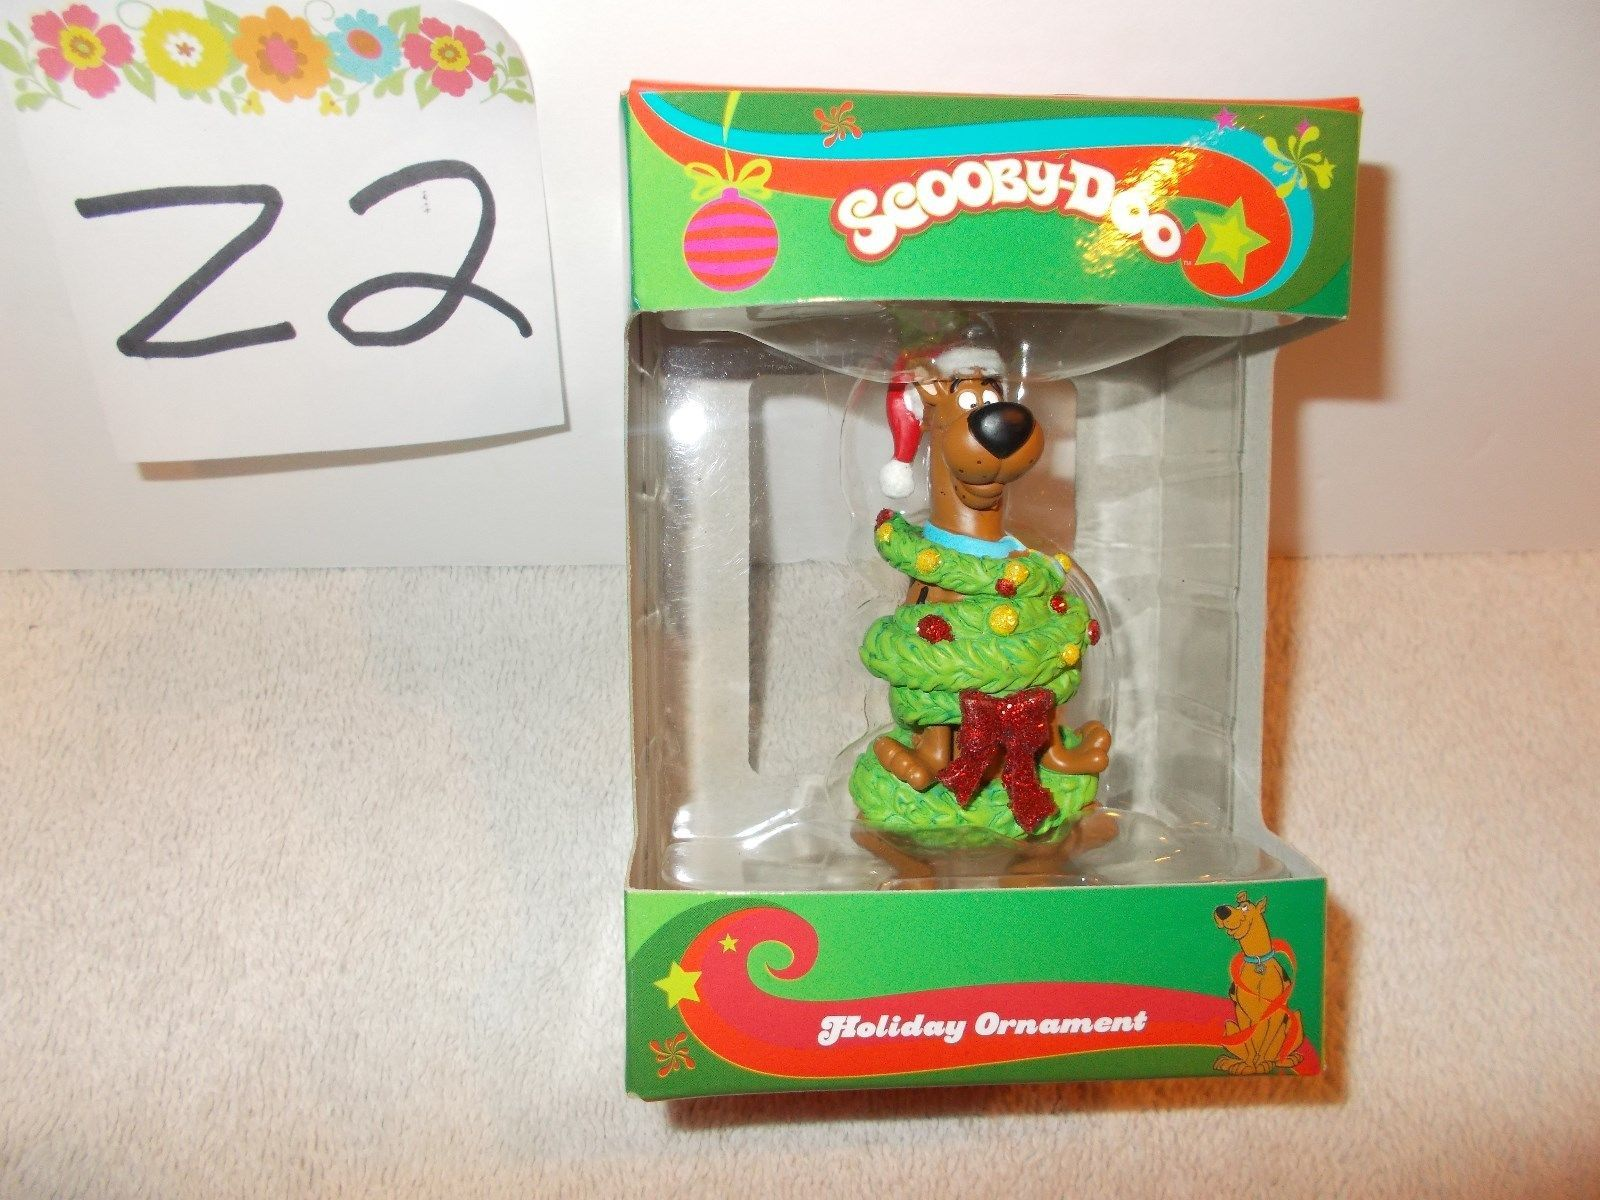 b6511717f5d37 Scooby-Doo 3D Figural Resin Ornament and 12 similar items